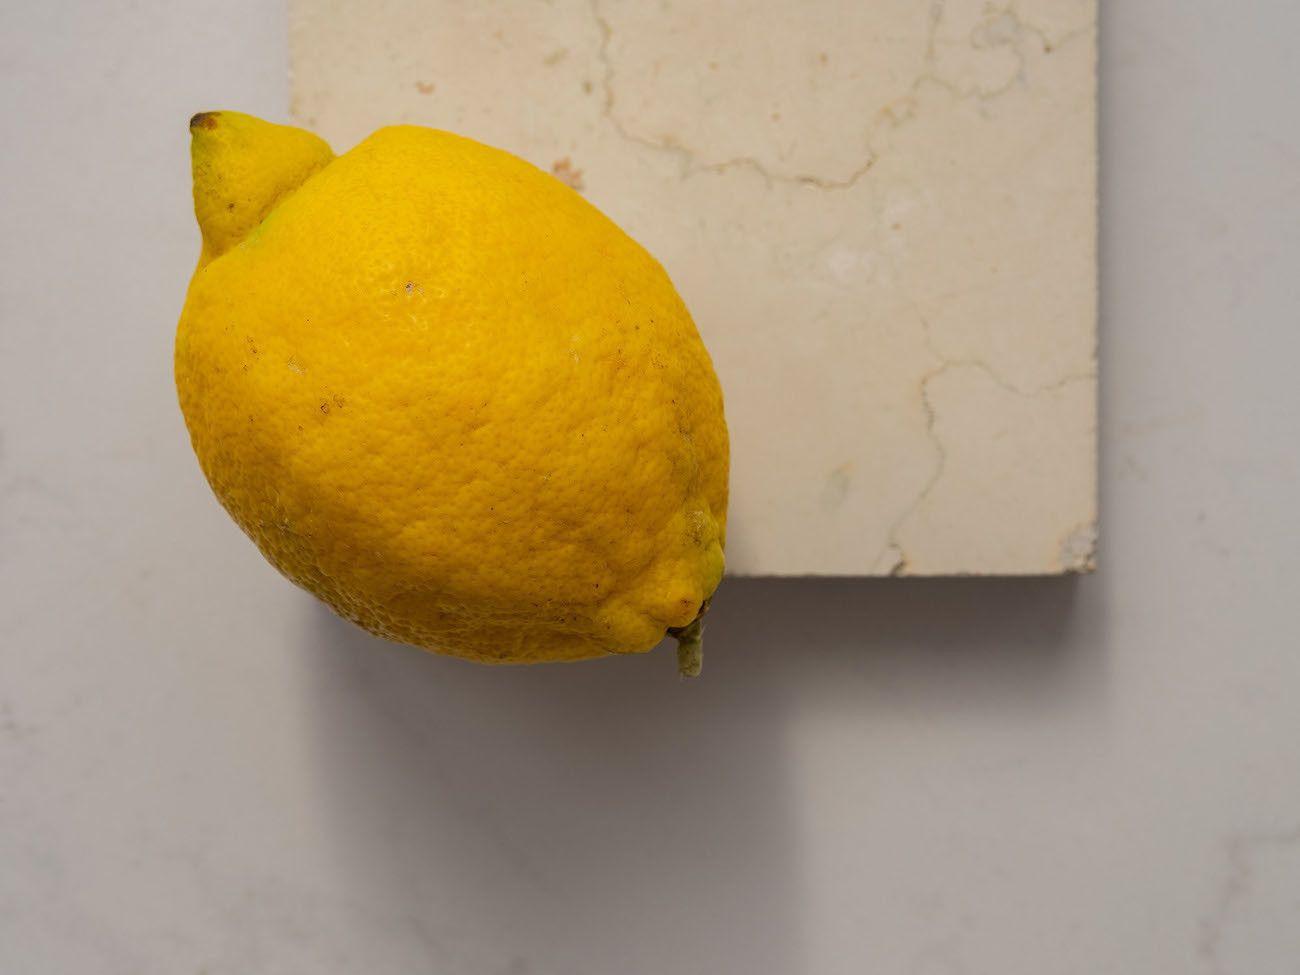 Foodblog About Fuel, Rezept Power Hugo, Saint Germain, Zitrone